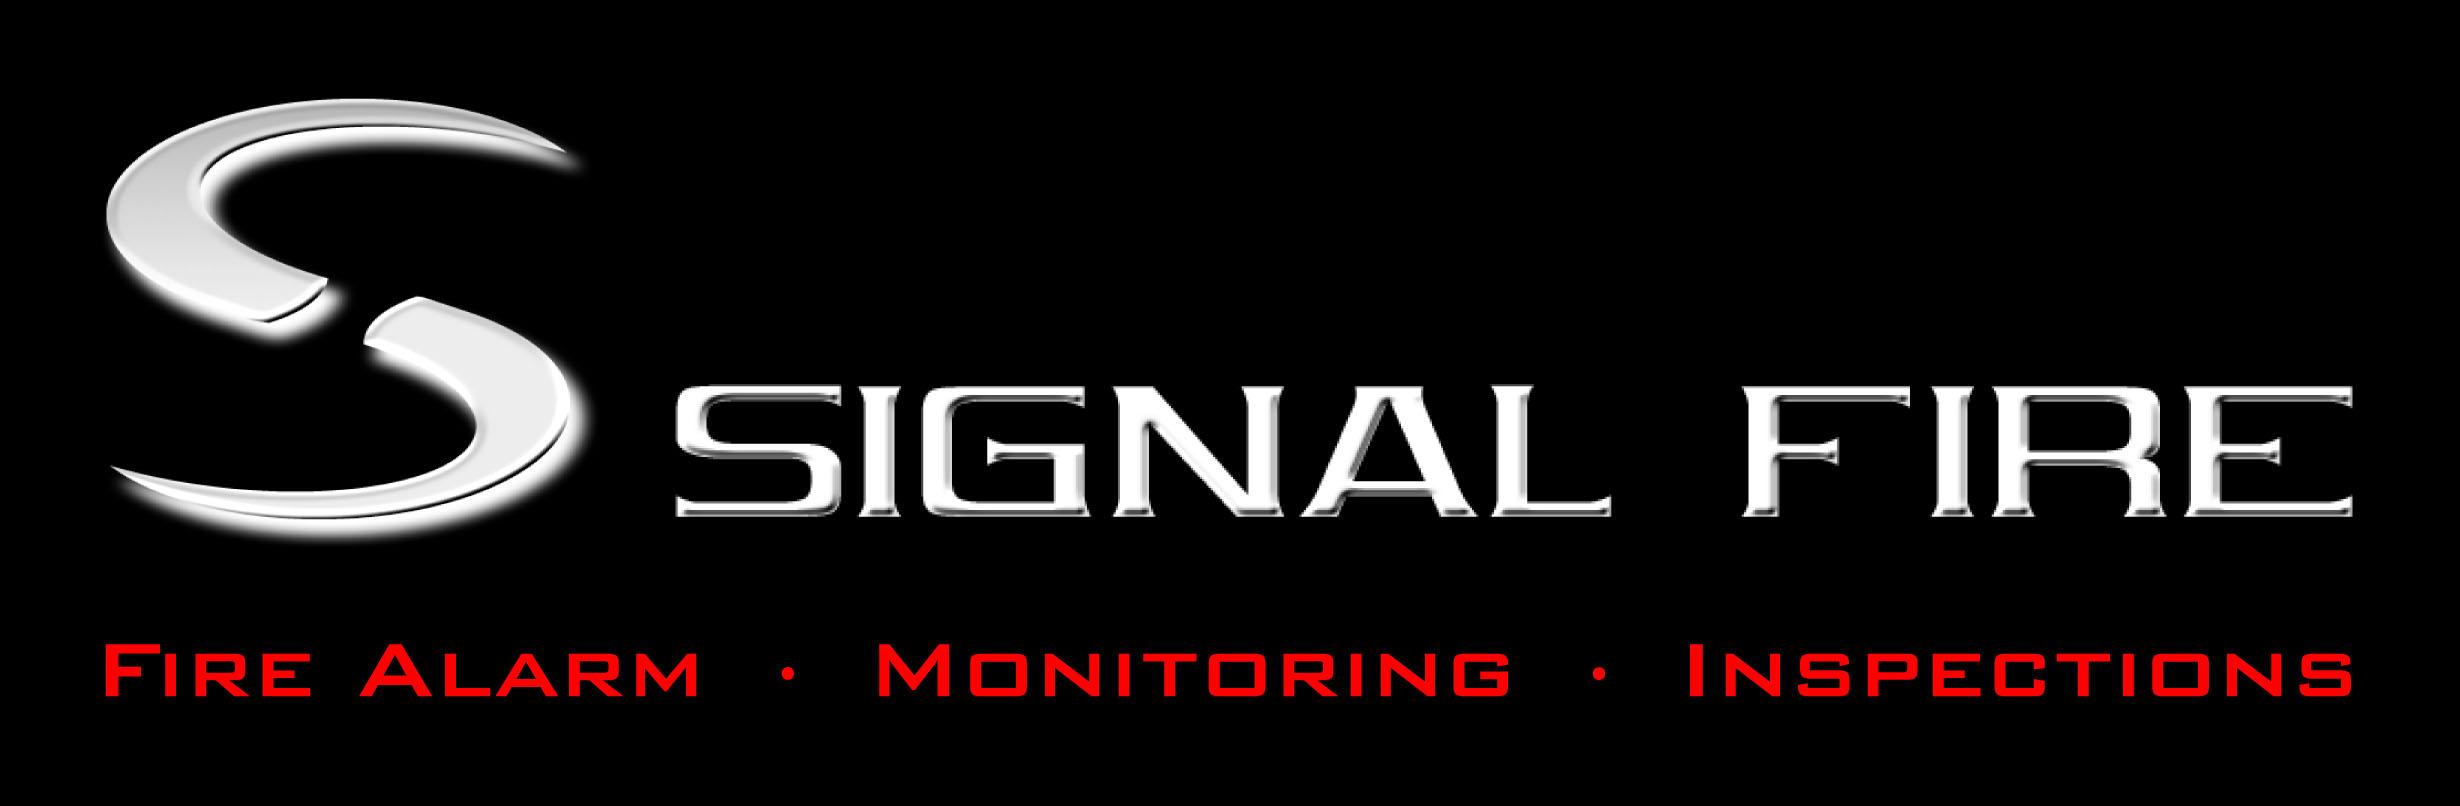 Signal Fire - Las Vegas, NV